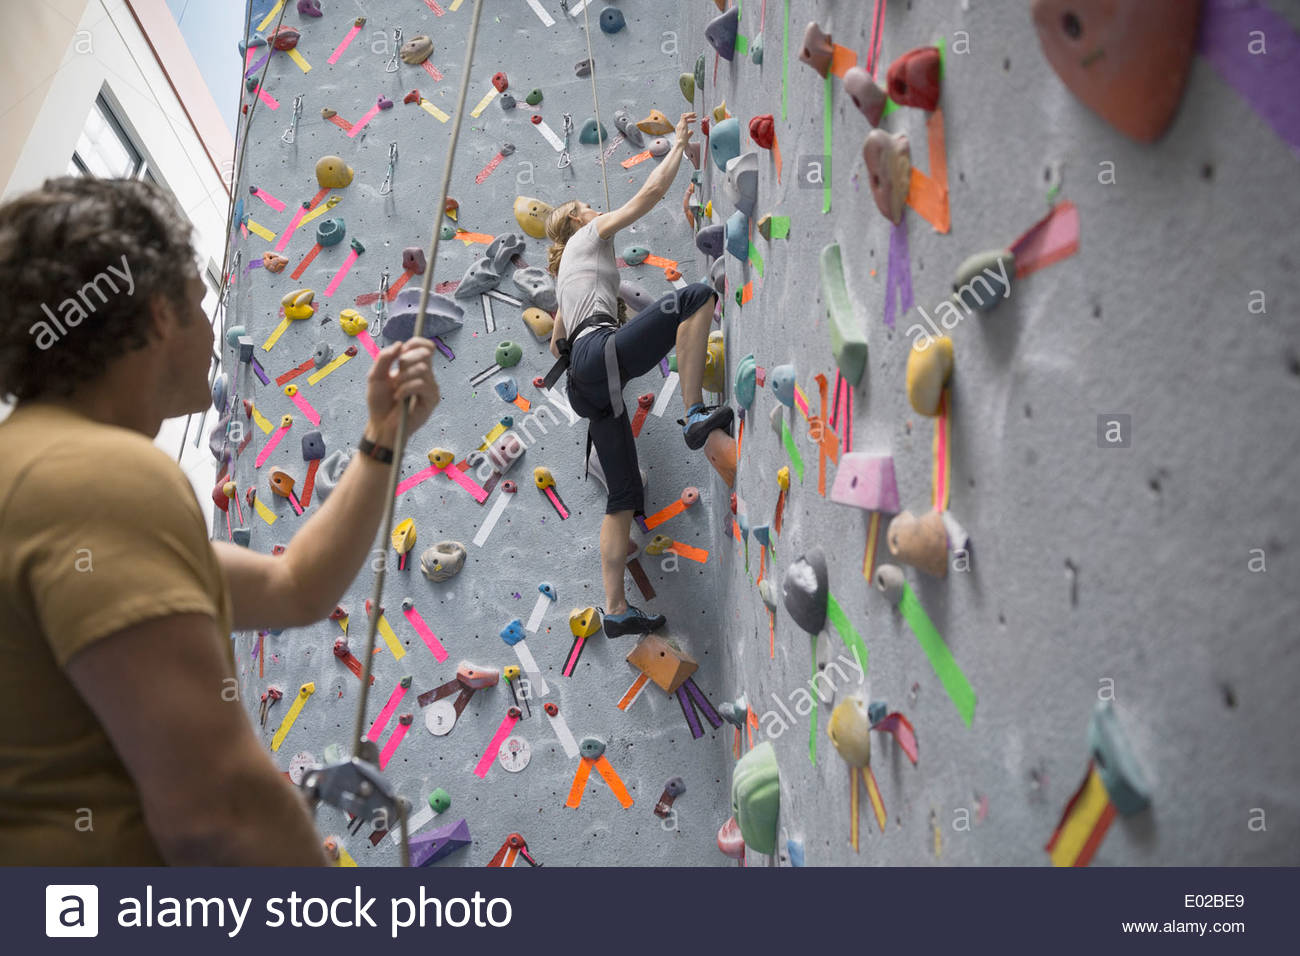 Man watching woman climb indoor rock wall - Stock Image